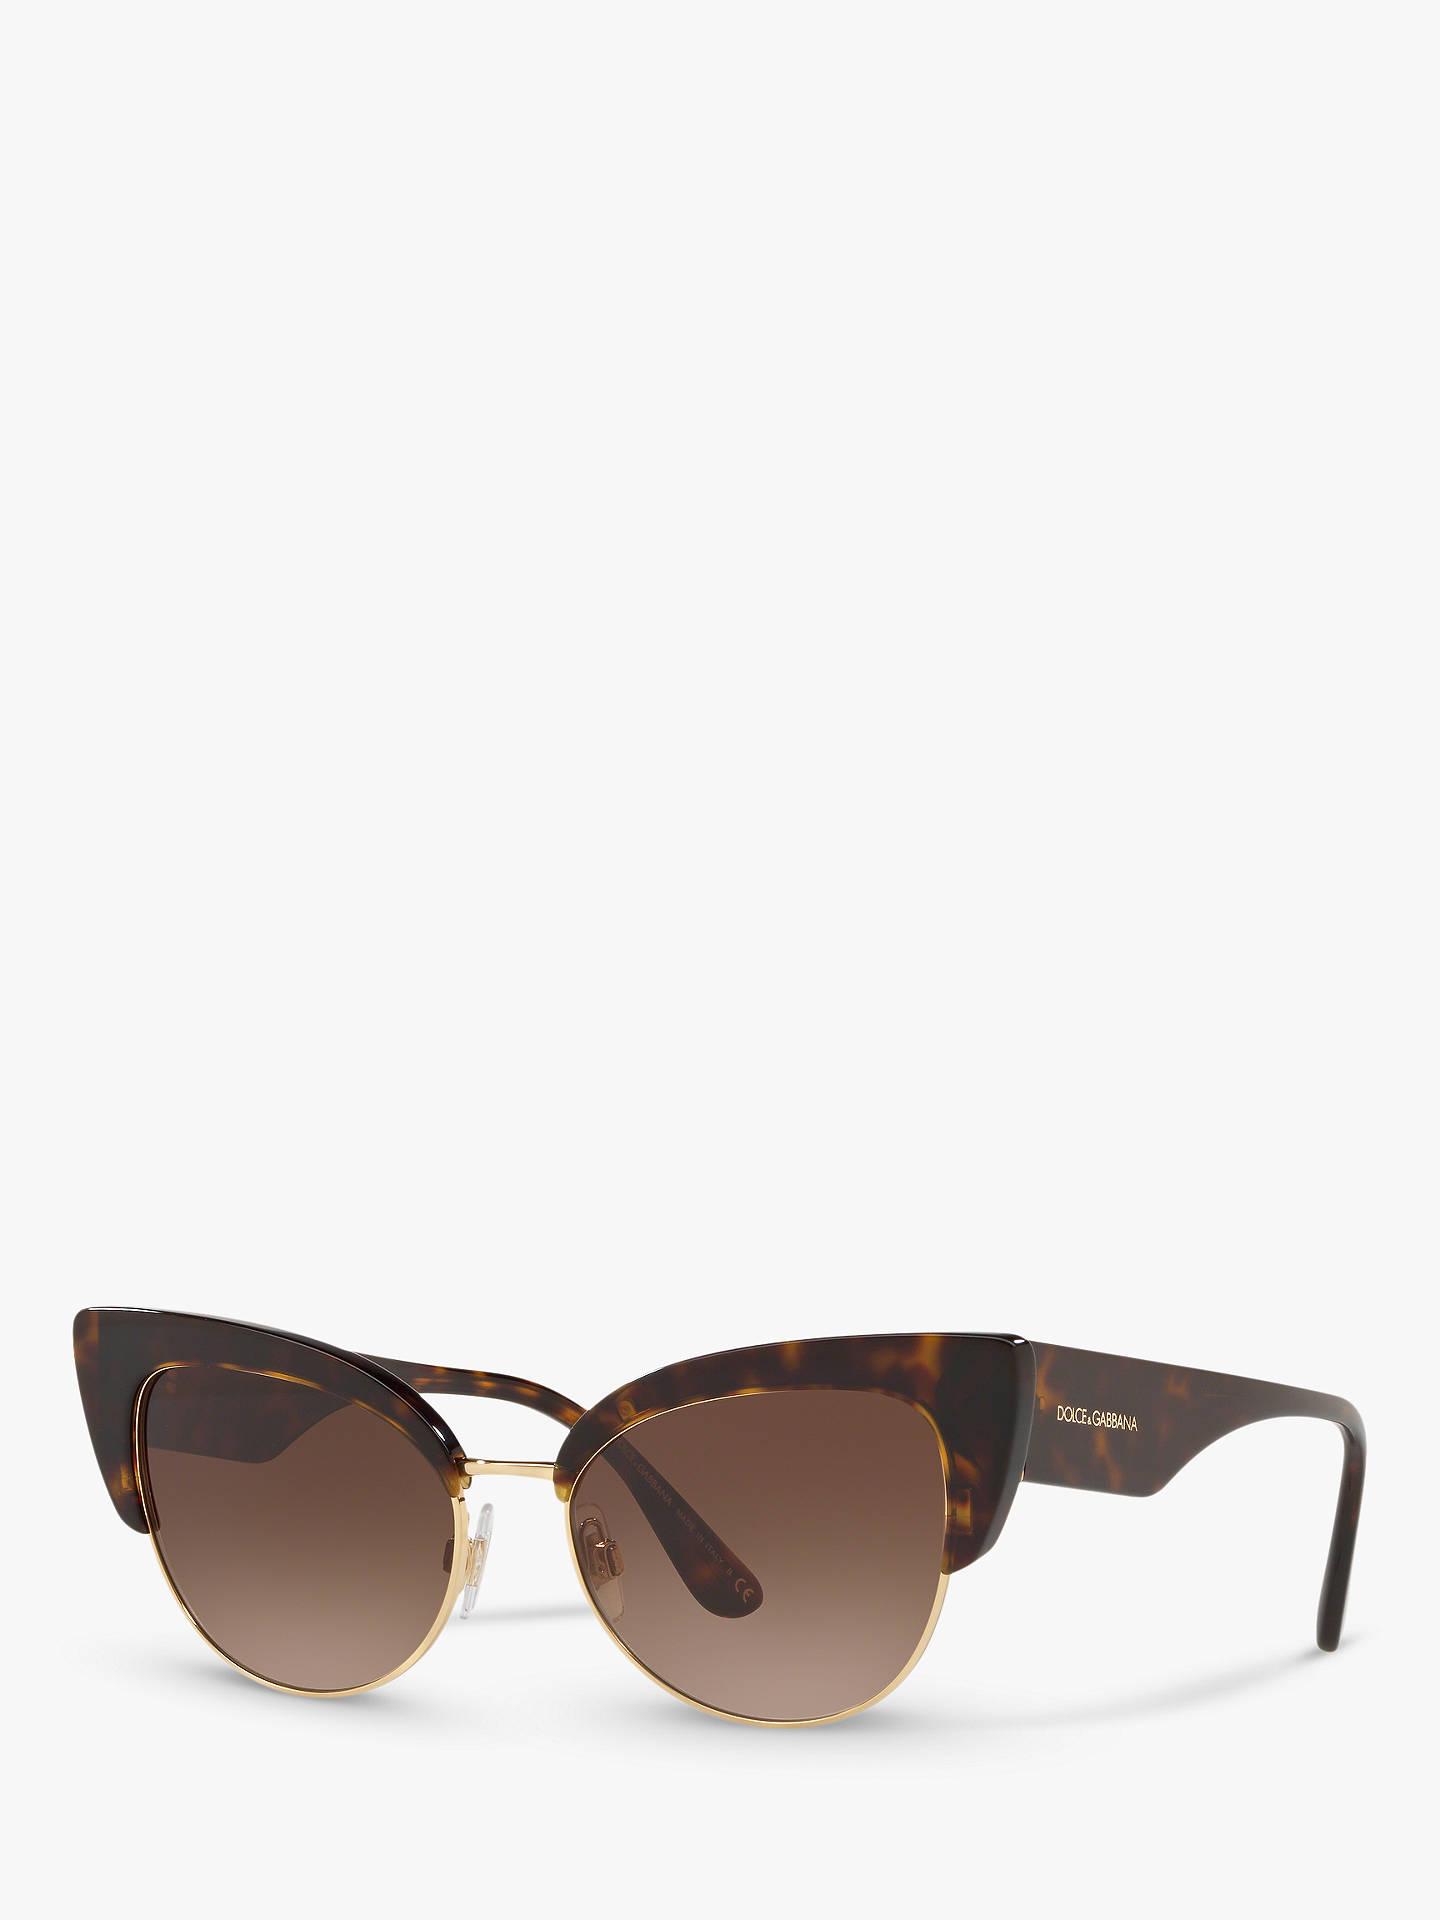 a13e424b7119 Dolce   Gabbana DG4346 Women s Cat s Eye Sunglasses at John Lewis ...